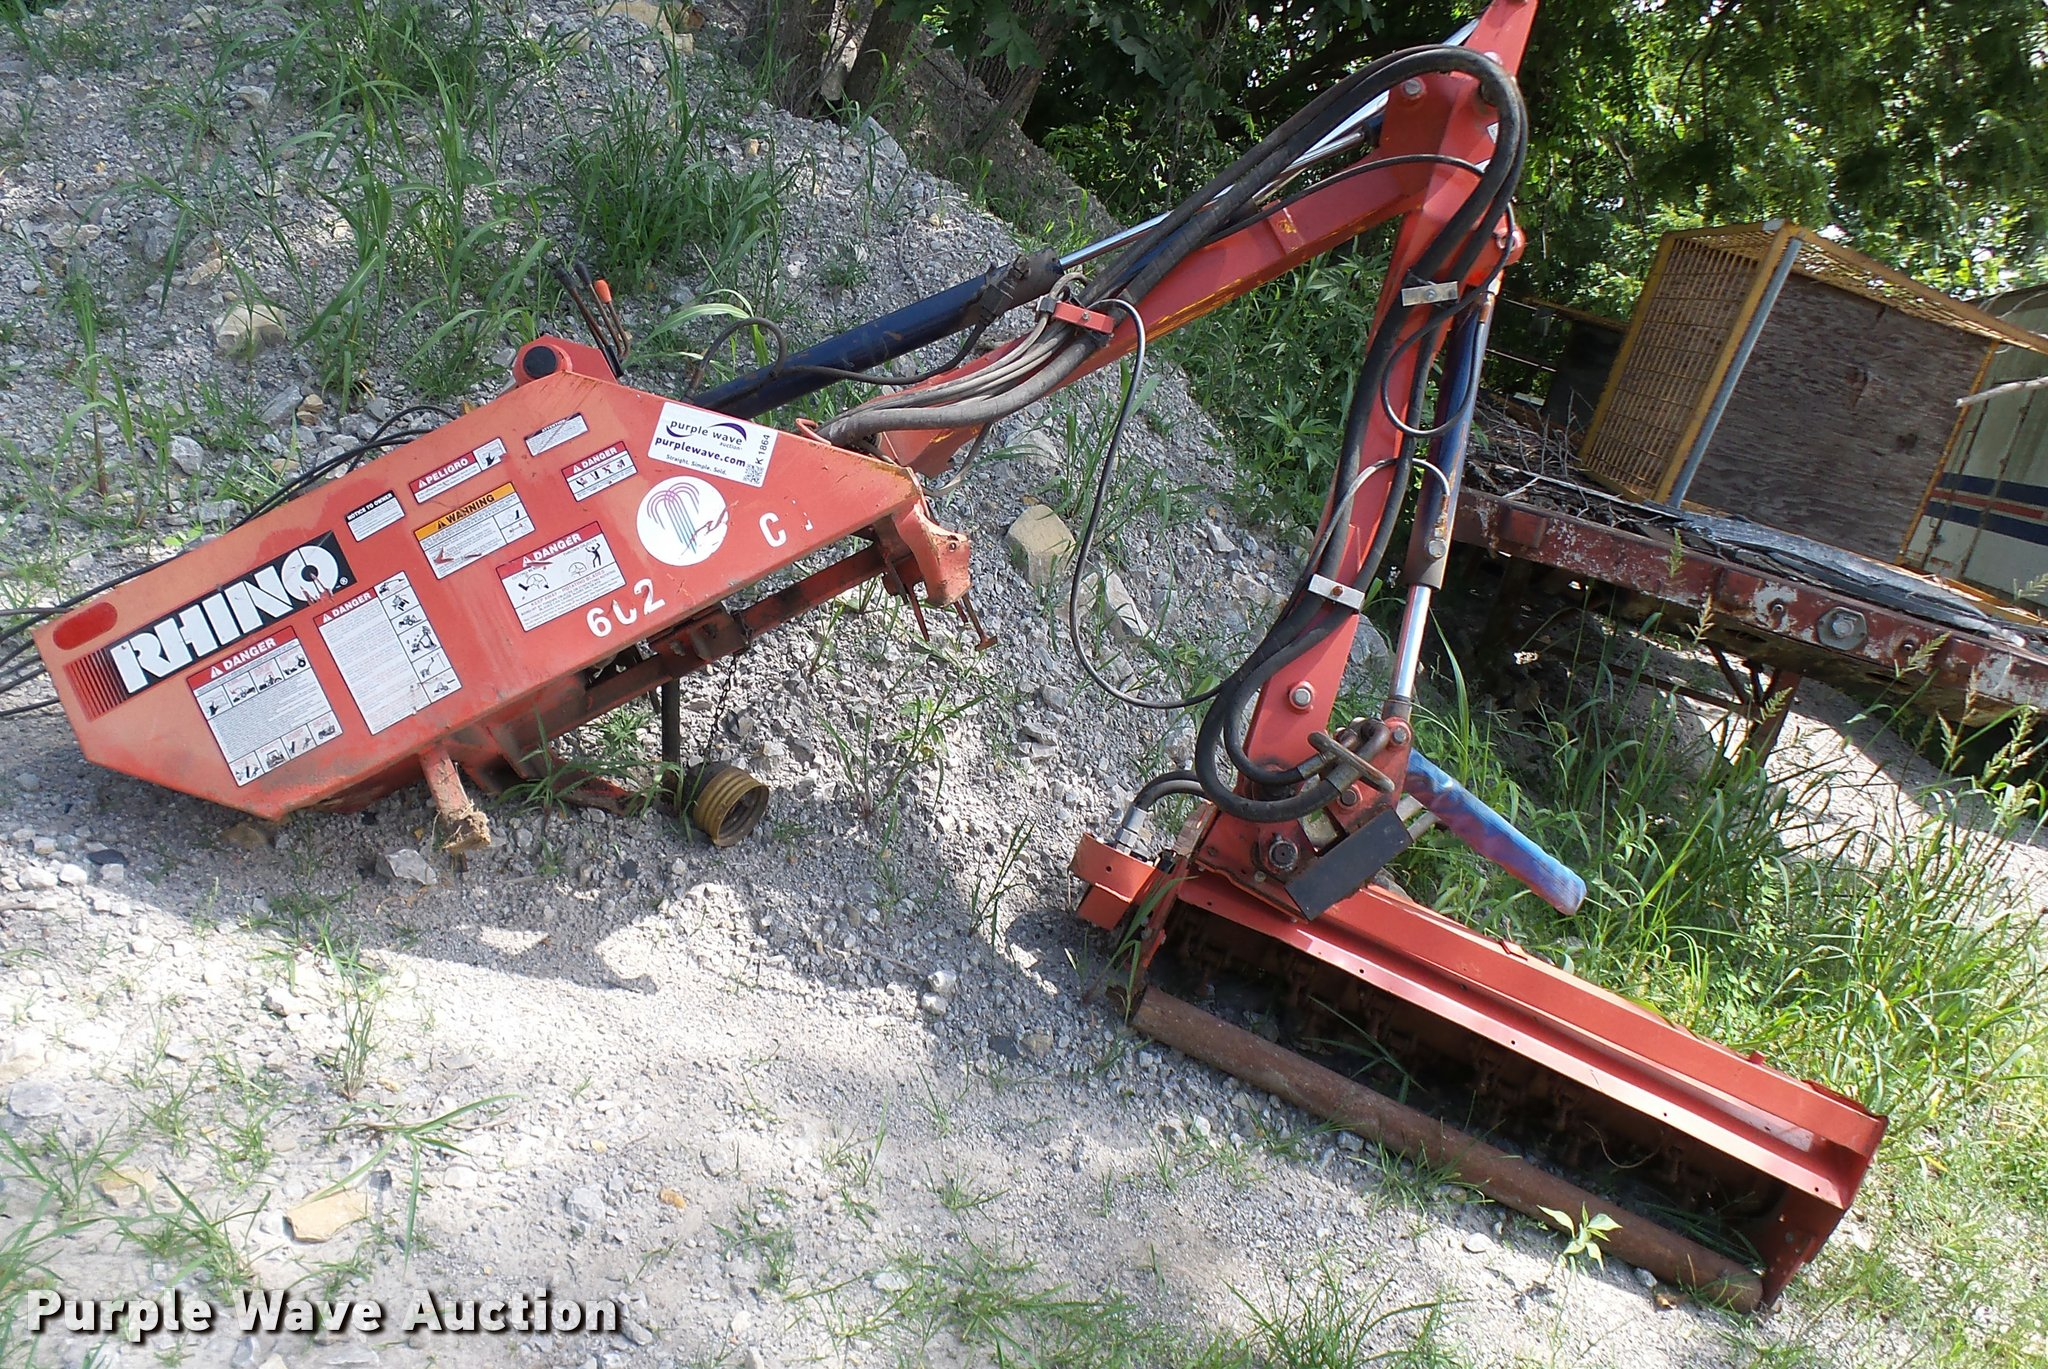 Rhino 07290013 boom flail mower | Item K1864 | SOLD! August